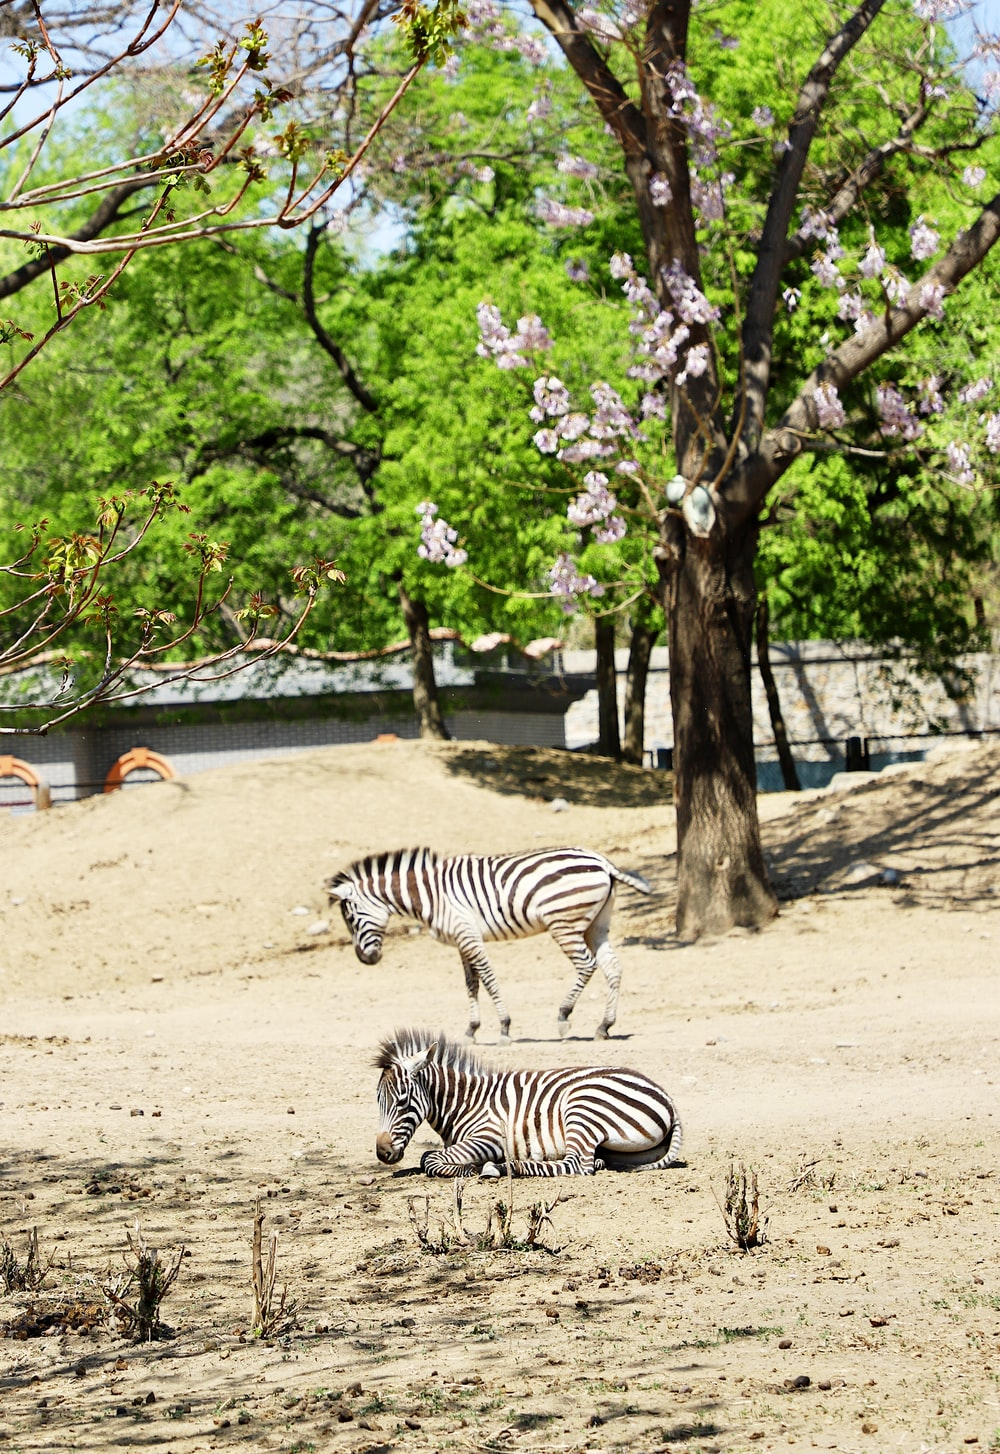 zebra standing on brown sand near green trees during daytime